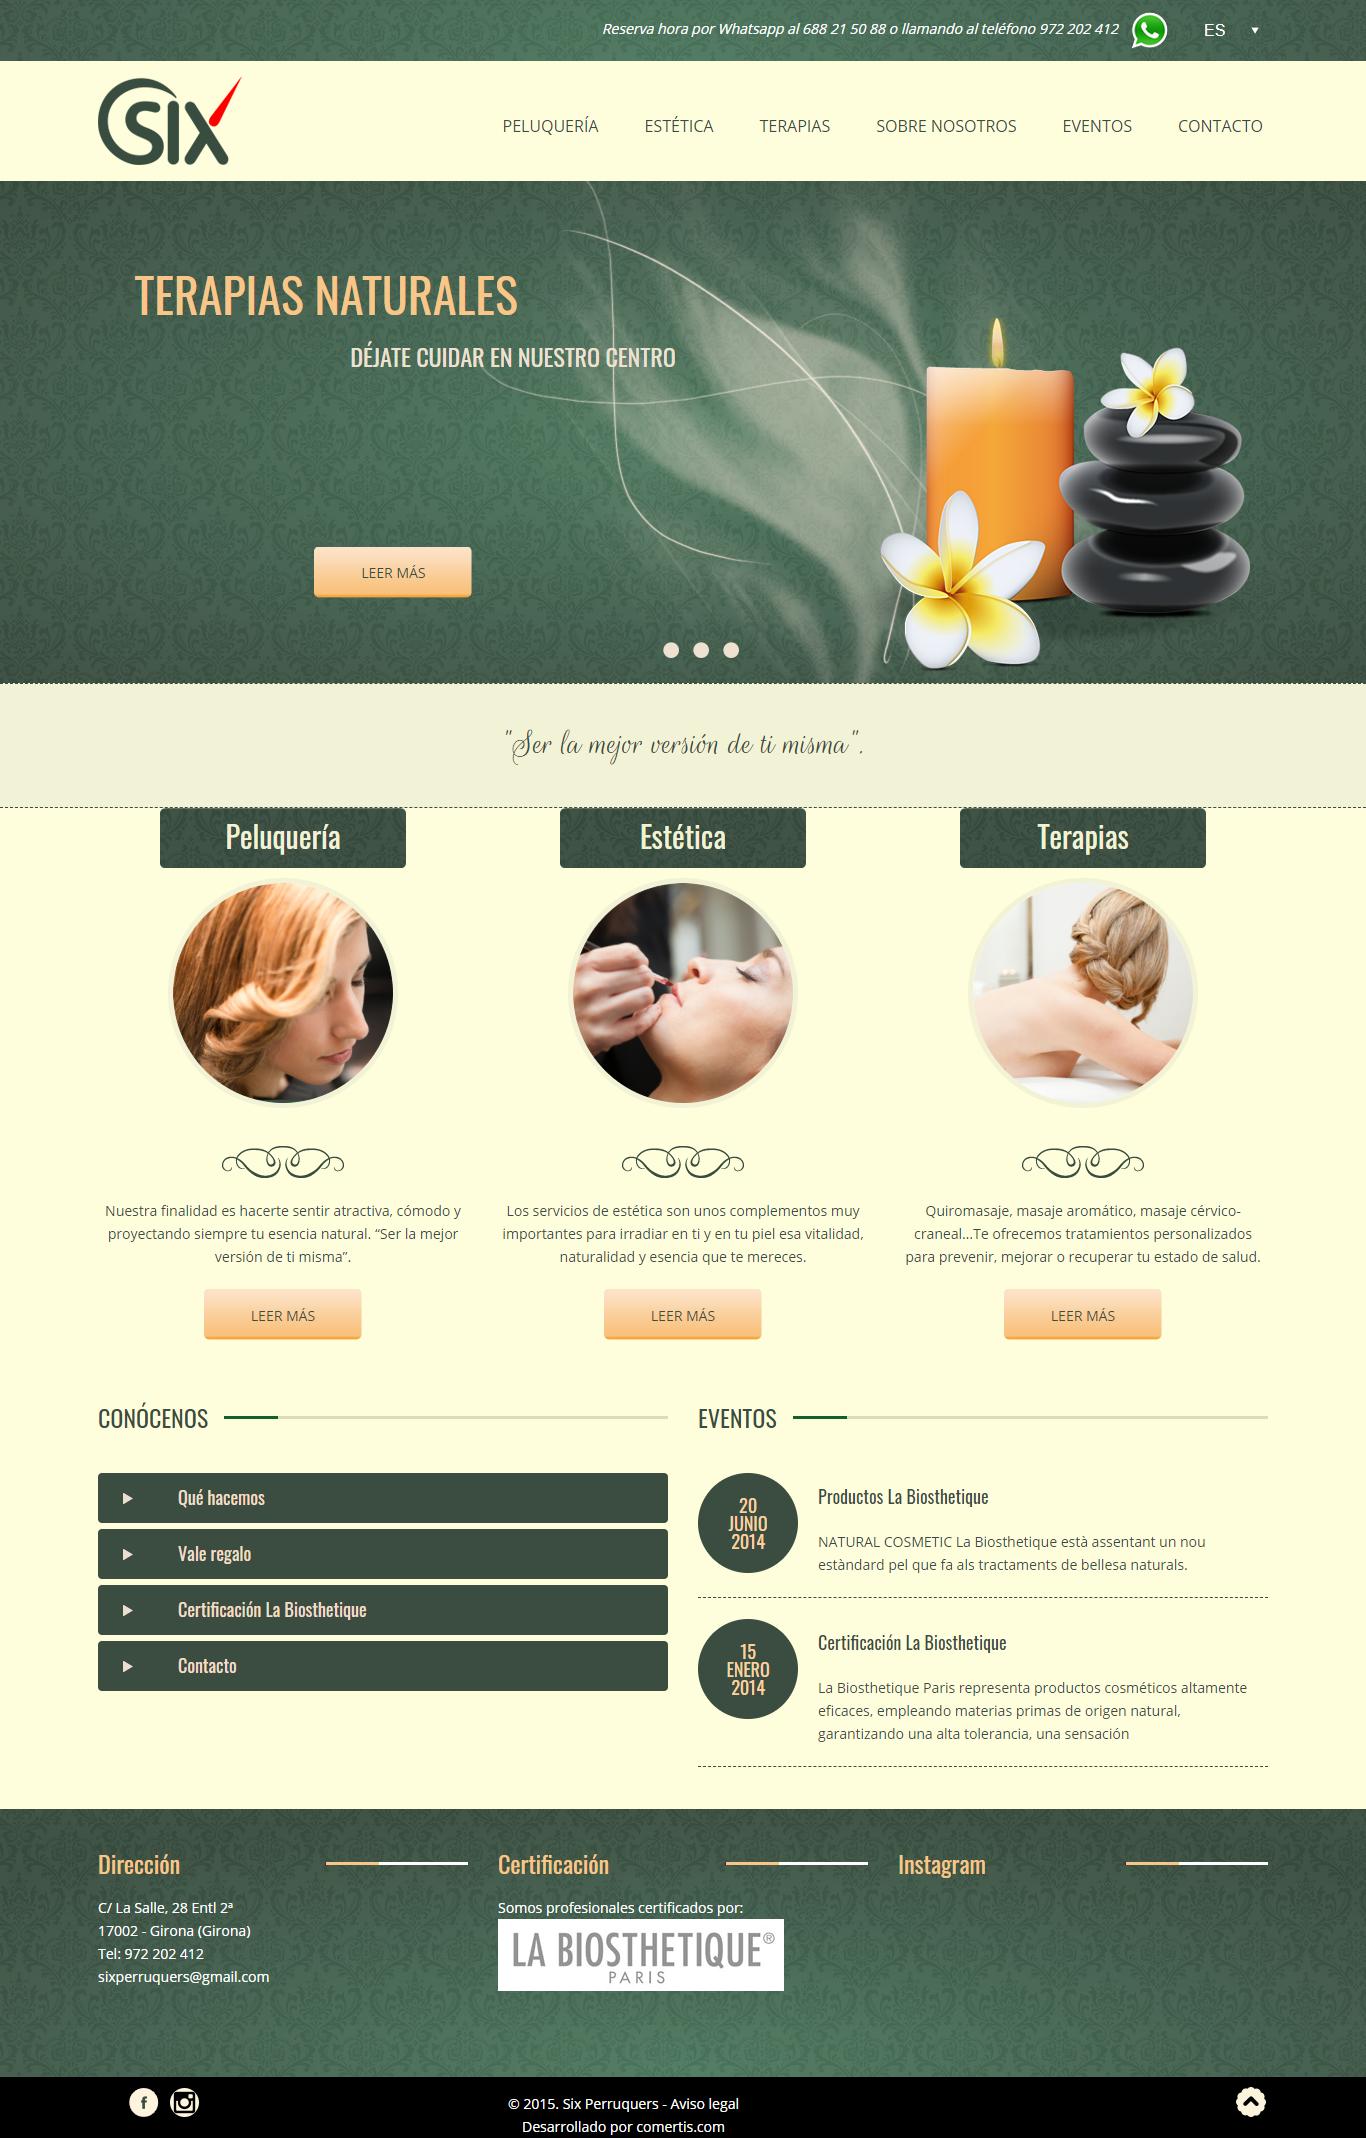 Botiga online Six perruquers